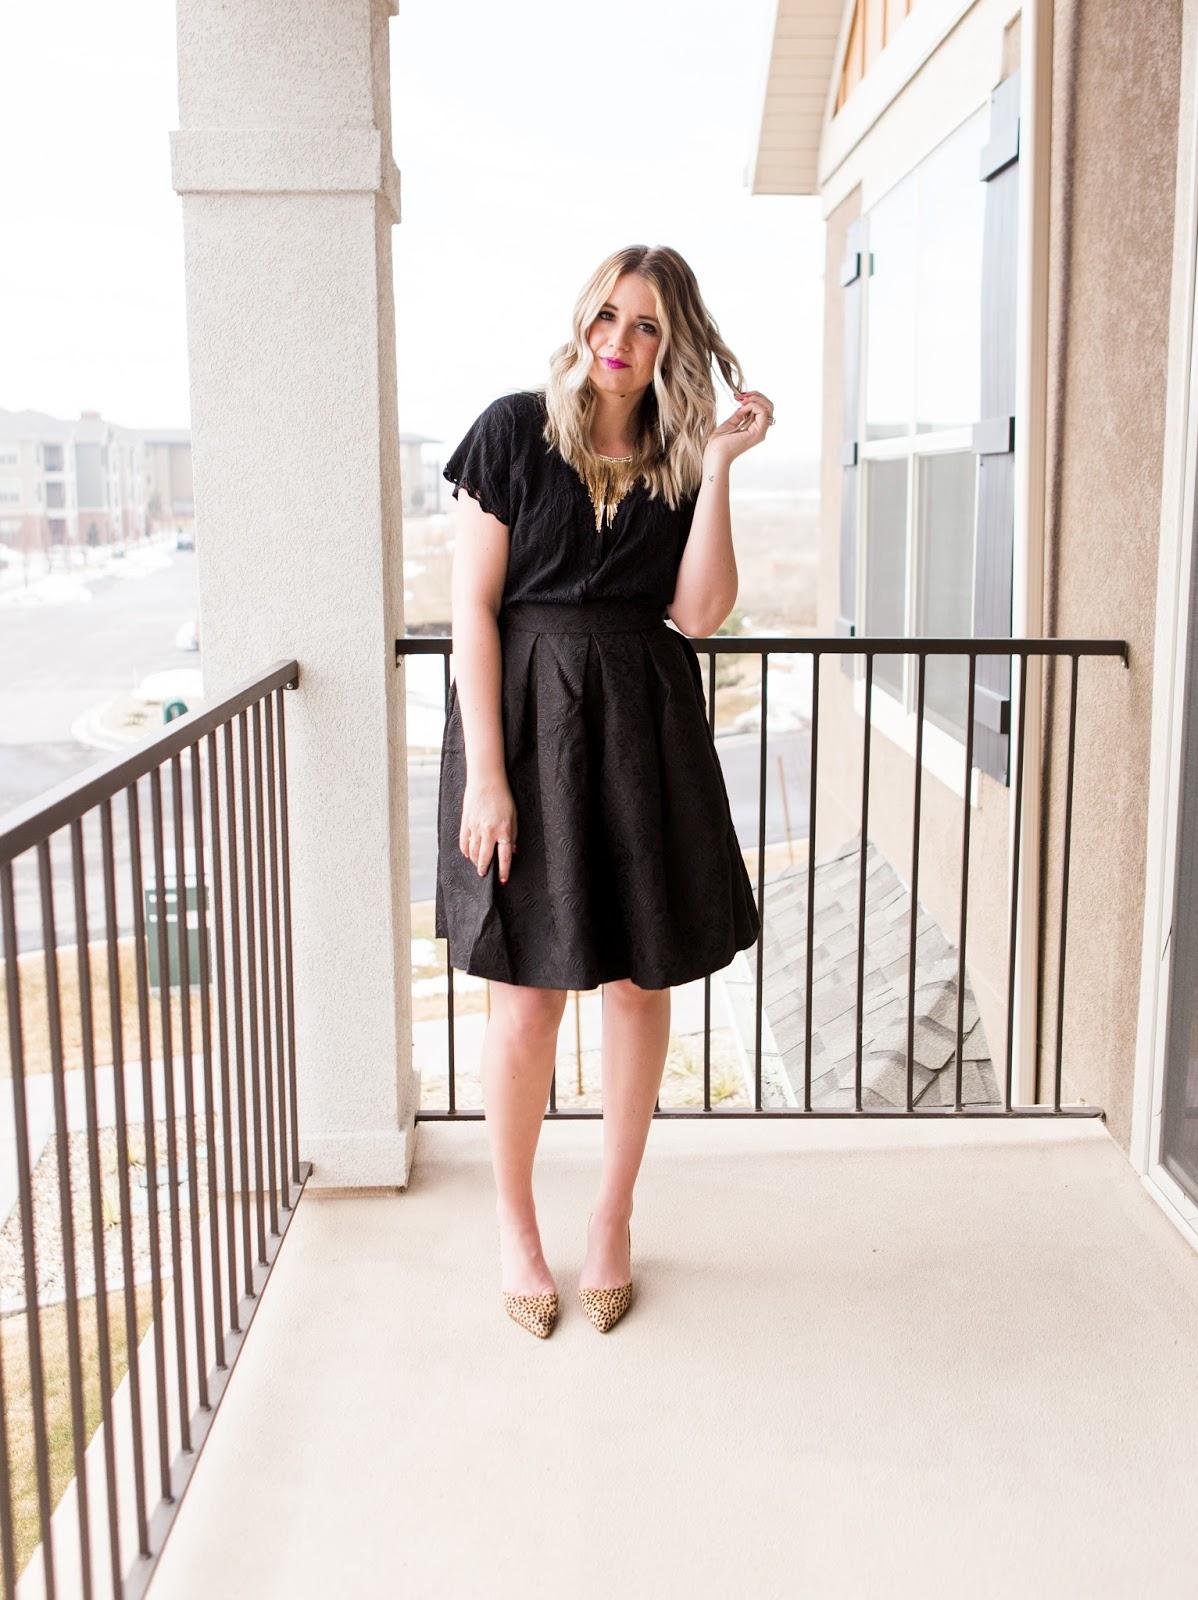 All Black, Cheetah Heels, Statement Necklace, Modest Fashion Blogger